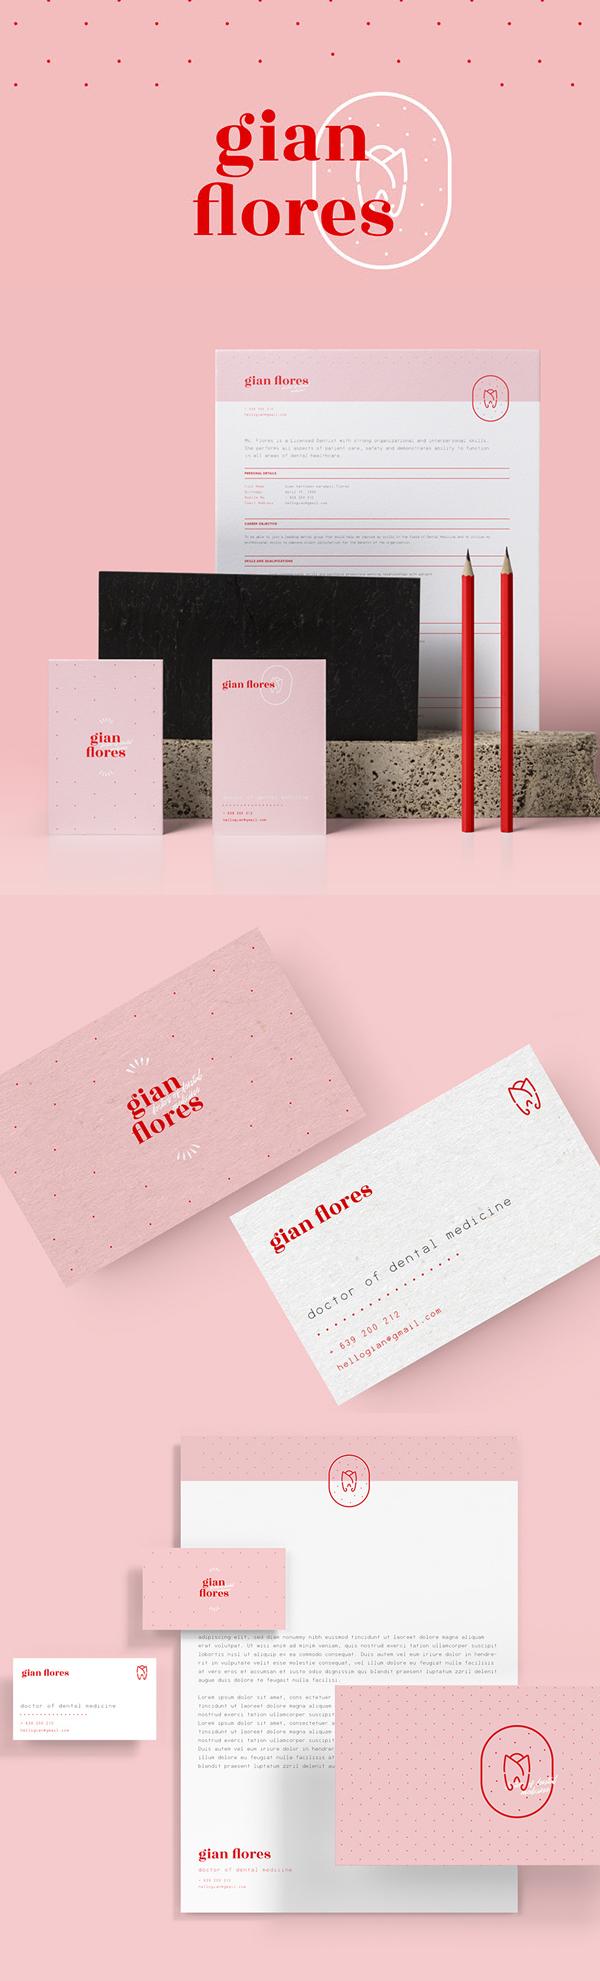 Branding: Dr. Gian Flores: Personal Identity branding by Princess Nicole Castañeda